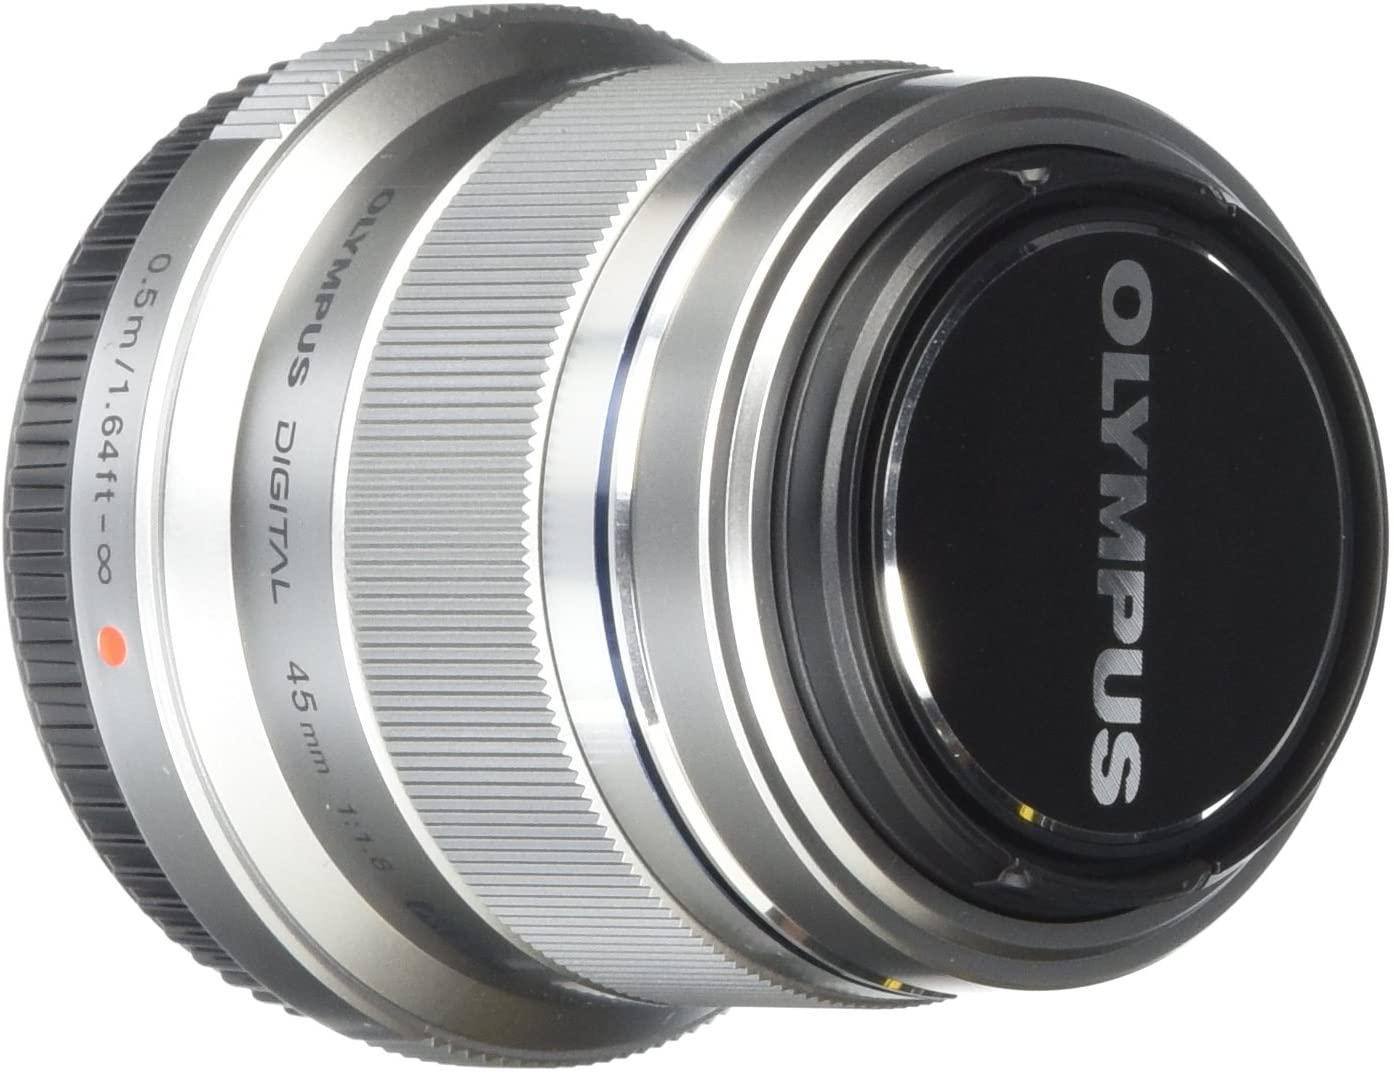 Olympus M.Zuiko Digital 45mm F1.8 Portrait Lens